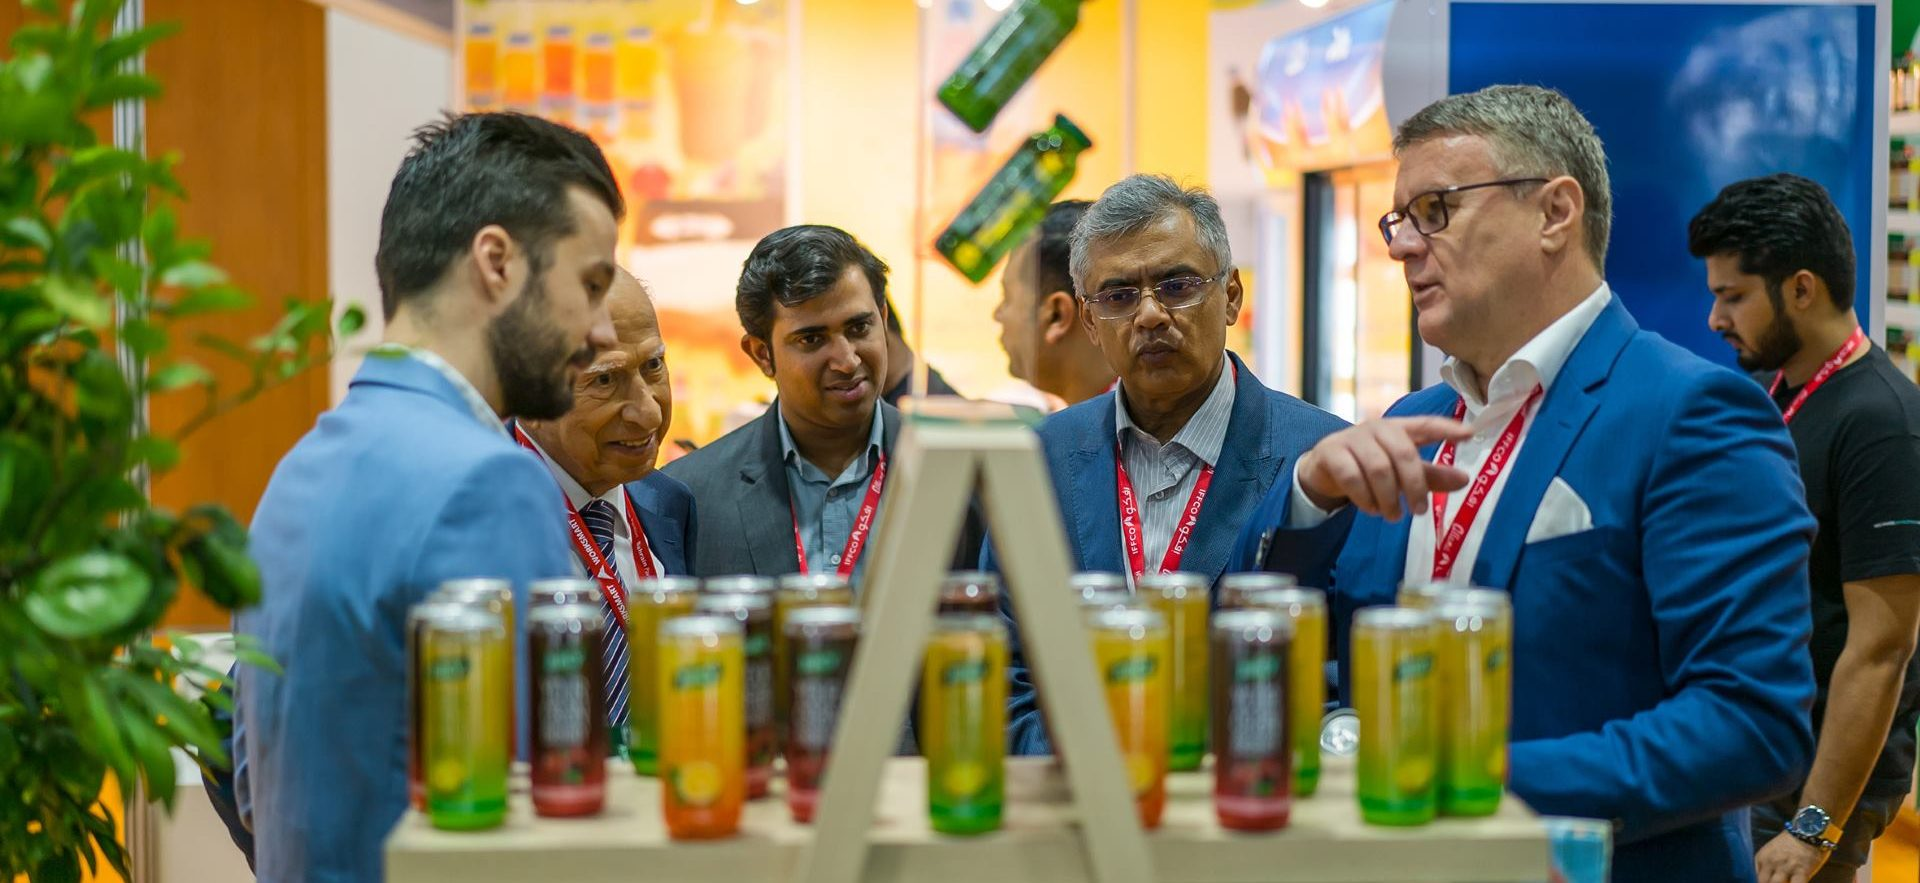 Stanić Beverages Hrvatska s brandom Juicy ulazi u Bahrein, Egipat i Jemen